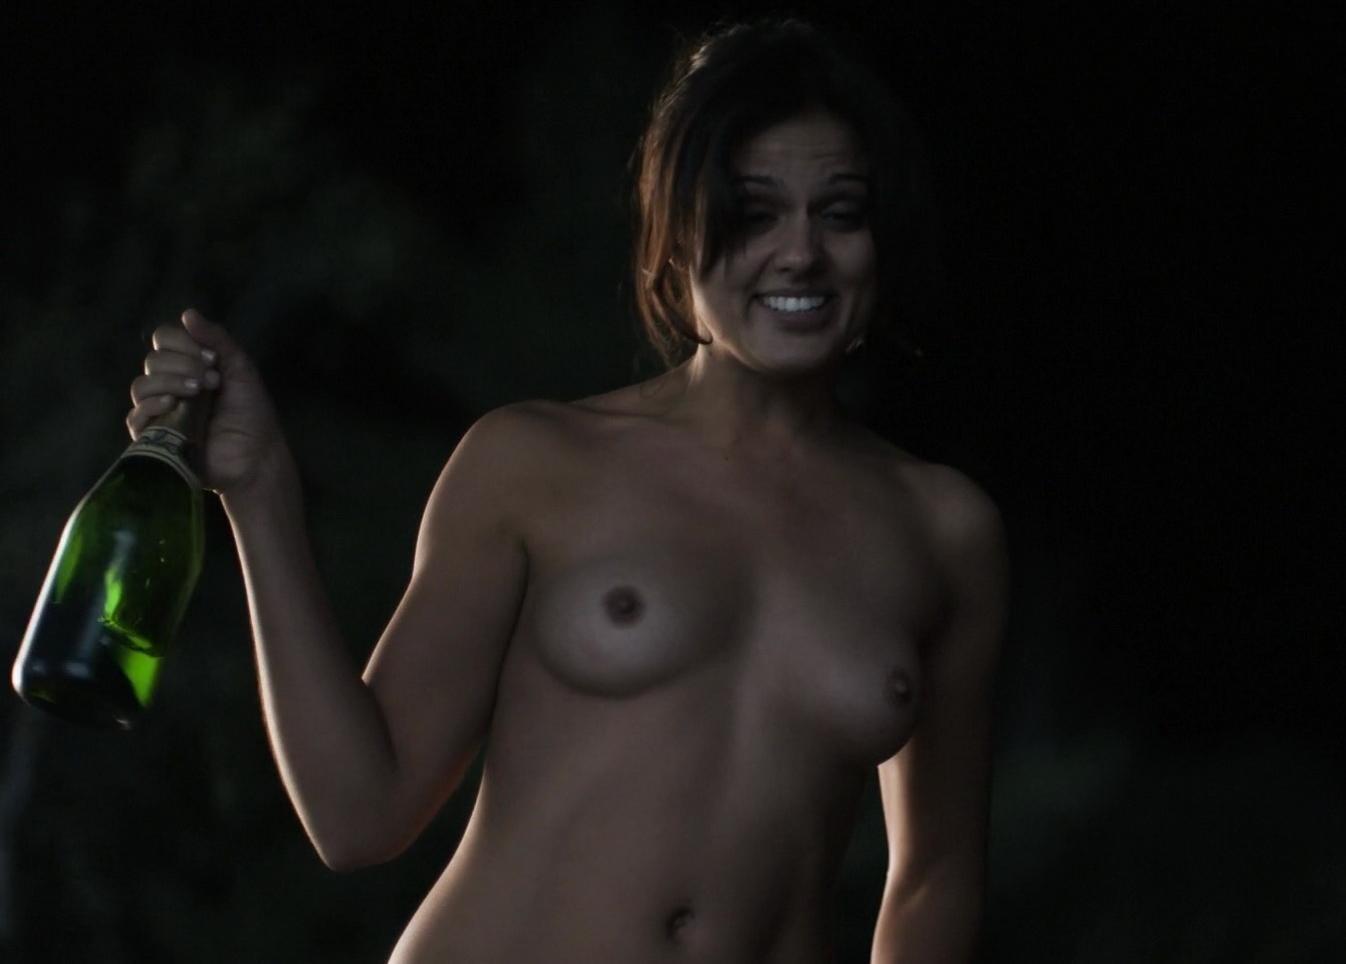 Gemma Whelan Nude - Farimg.com